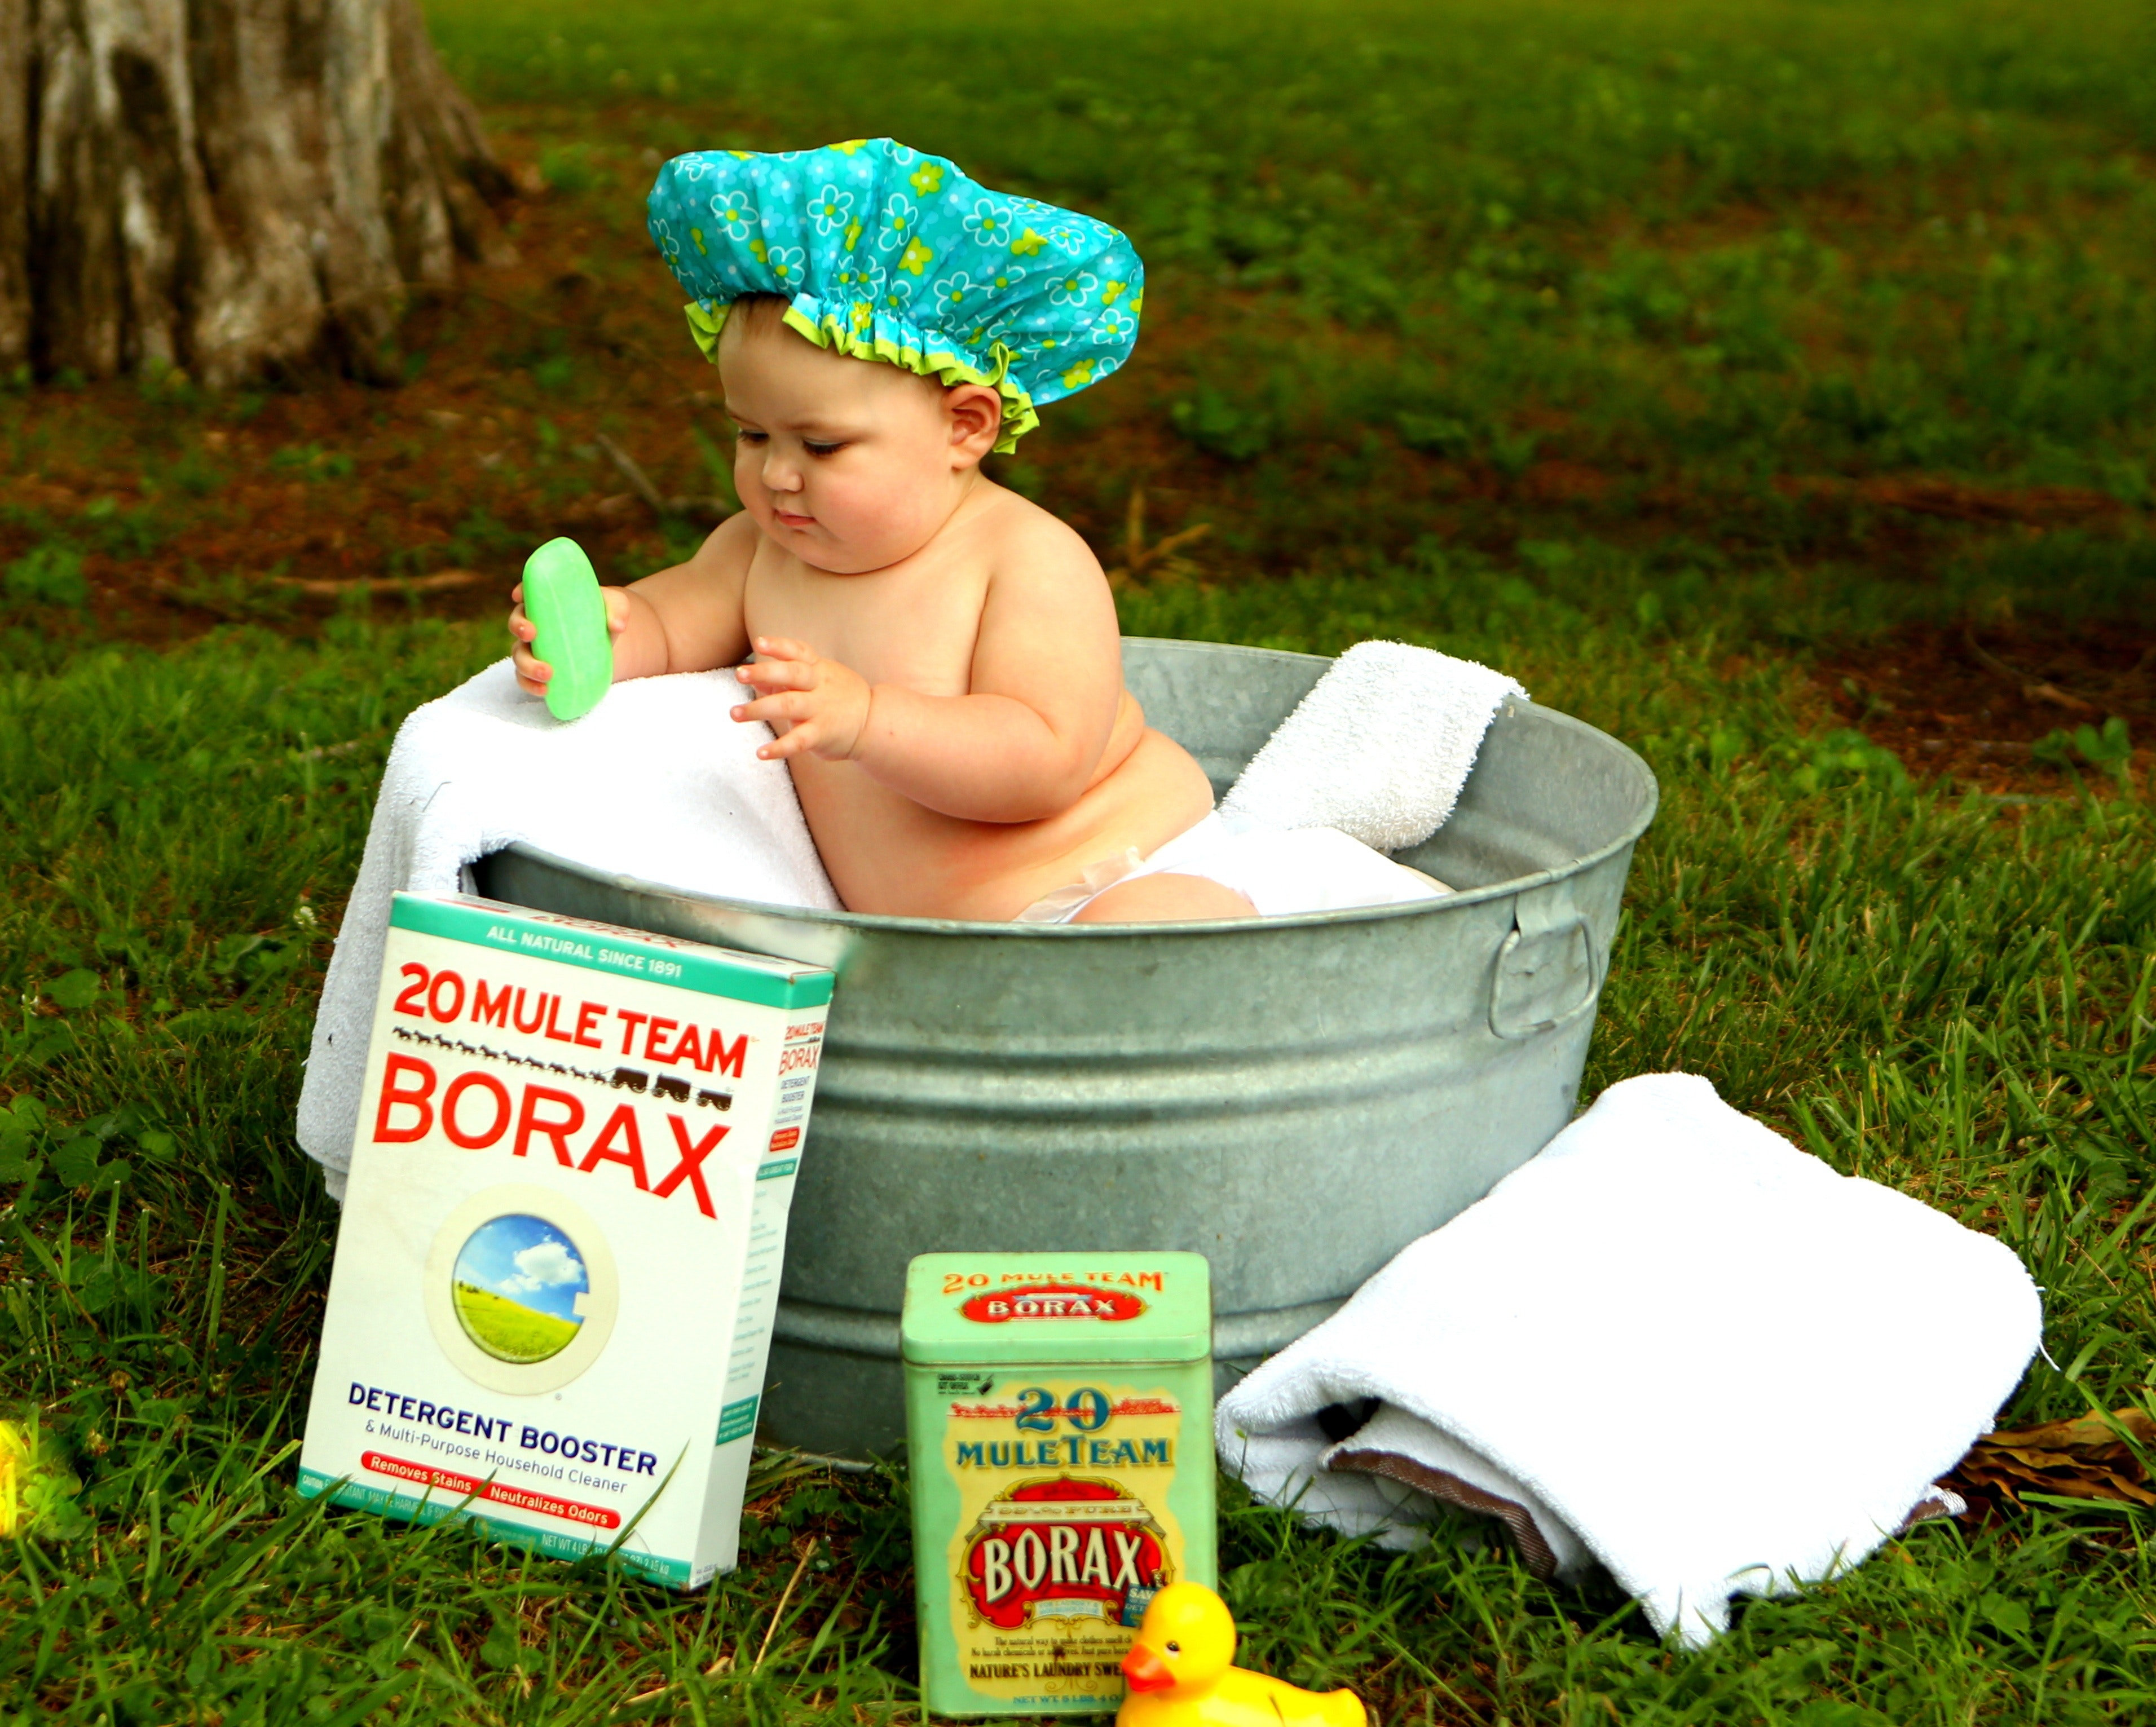 Shirtless baby boy in galvanized tub photo